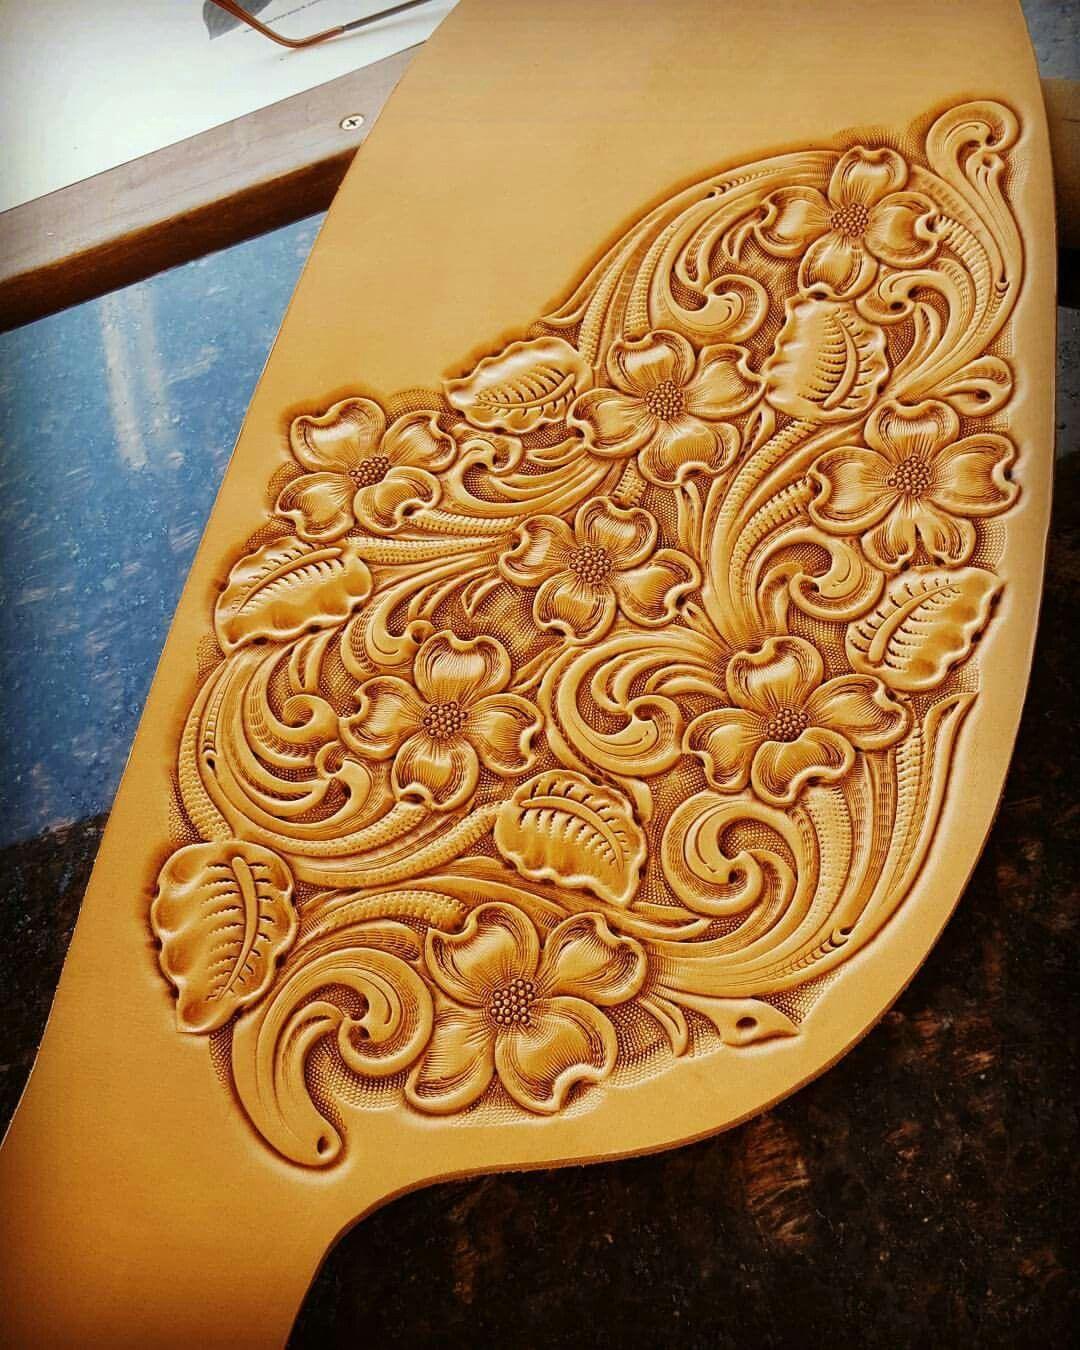 Cary schwarz cowboy craftsmen saddles chaps chinks